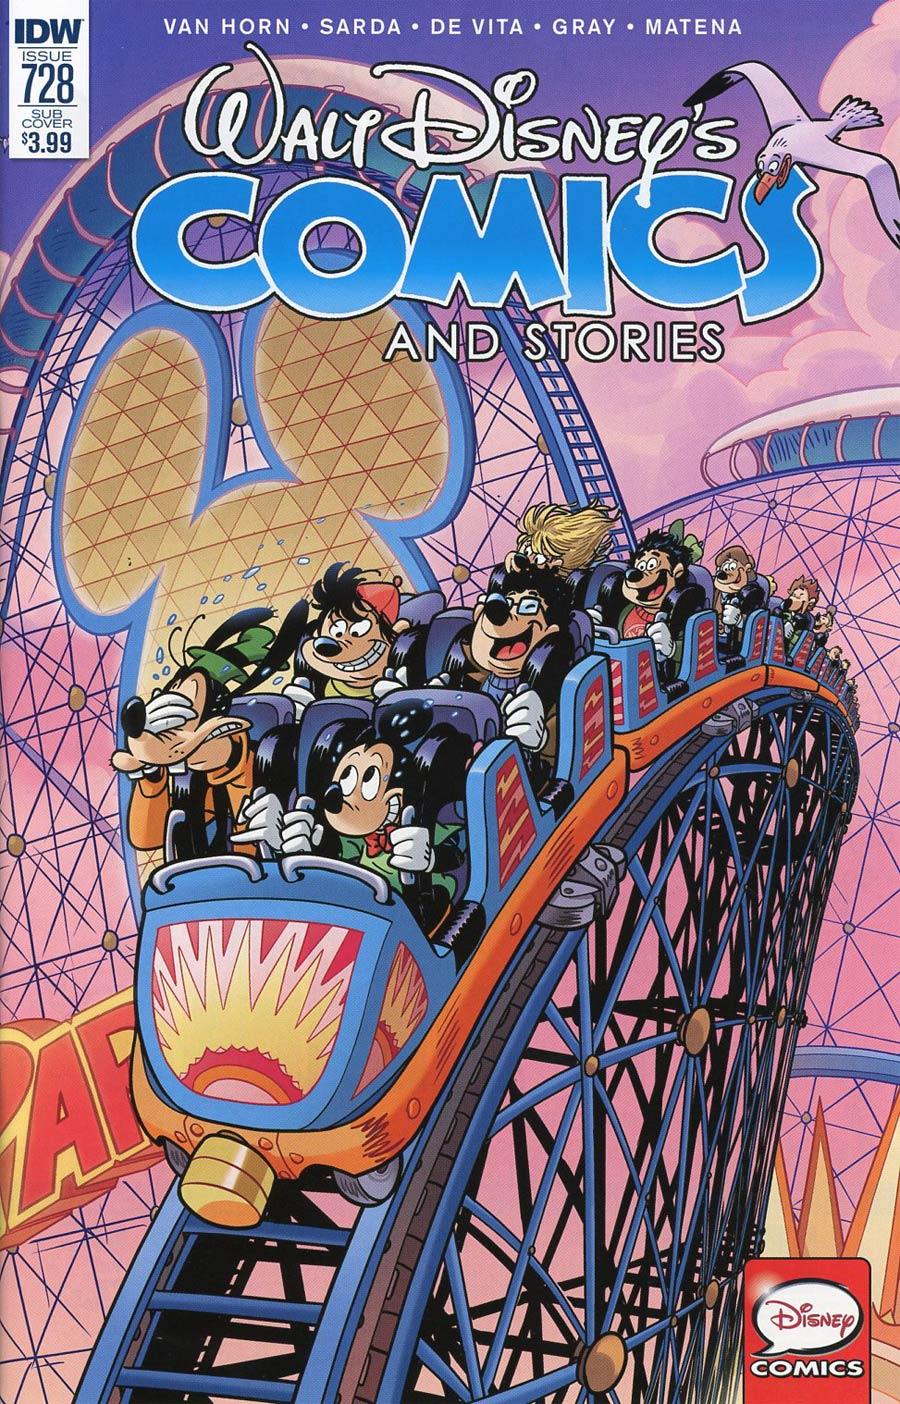 Walt Disneys Comics & Stories #728 Cover B Variant Silvio Camboni California Screamin Subscription Cover